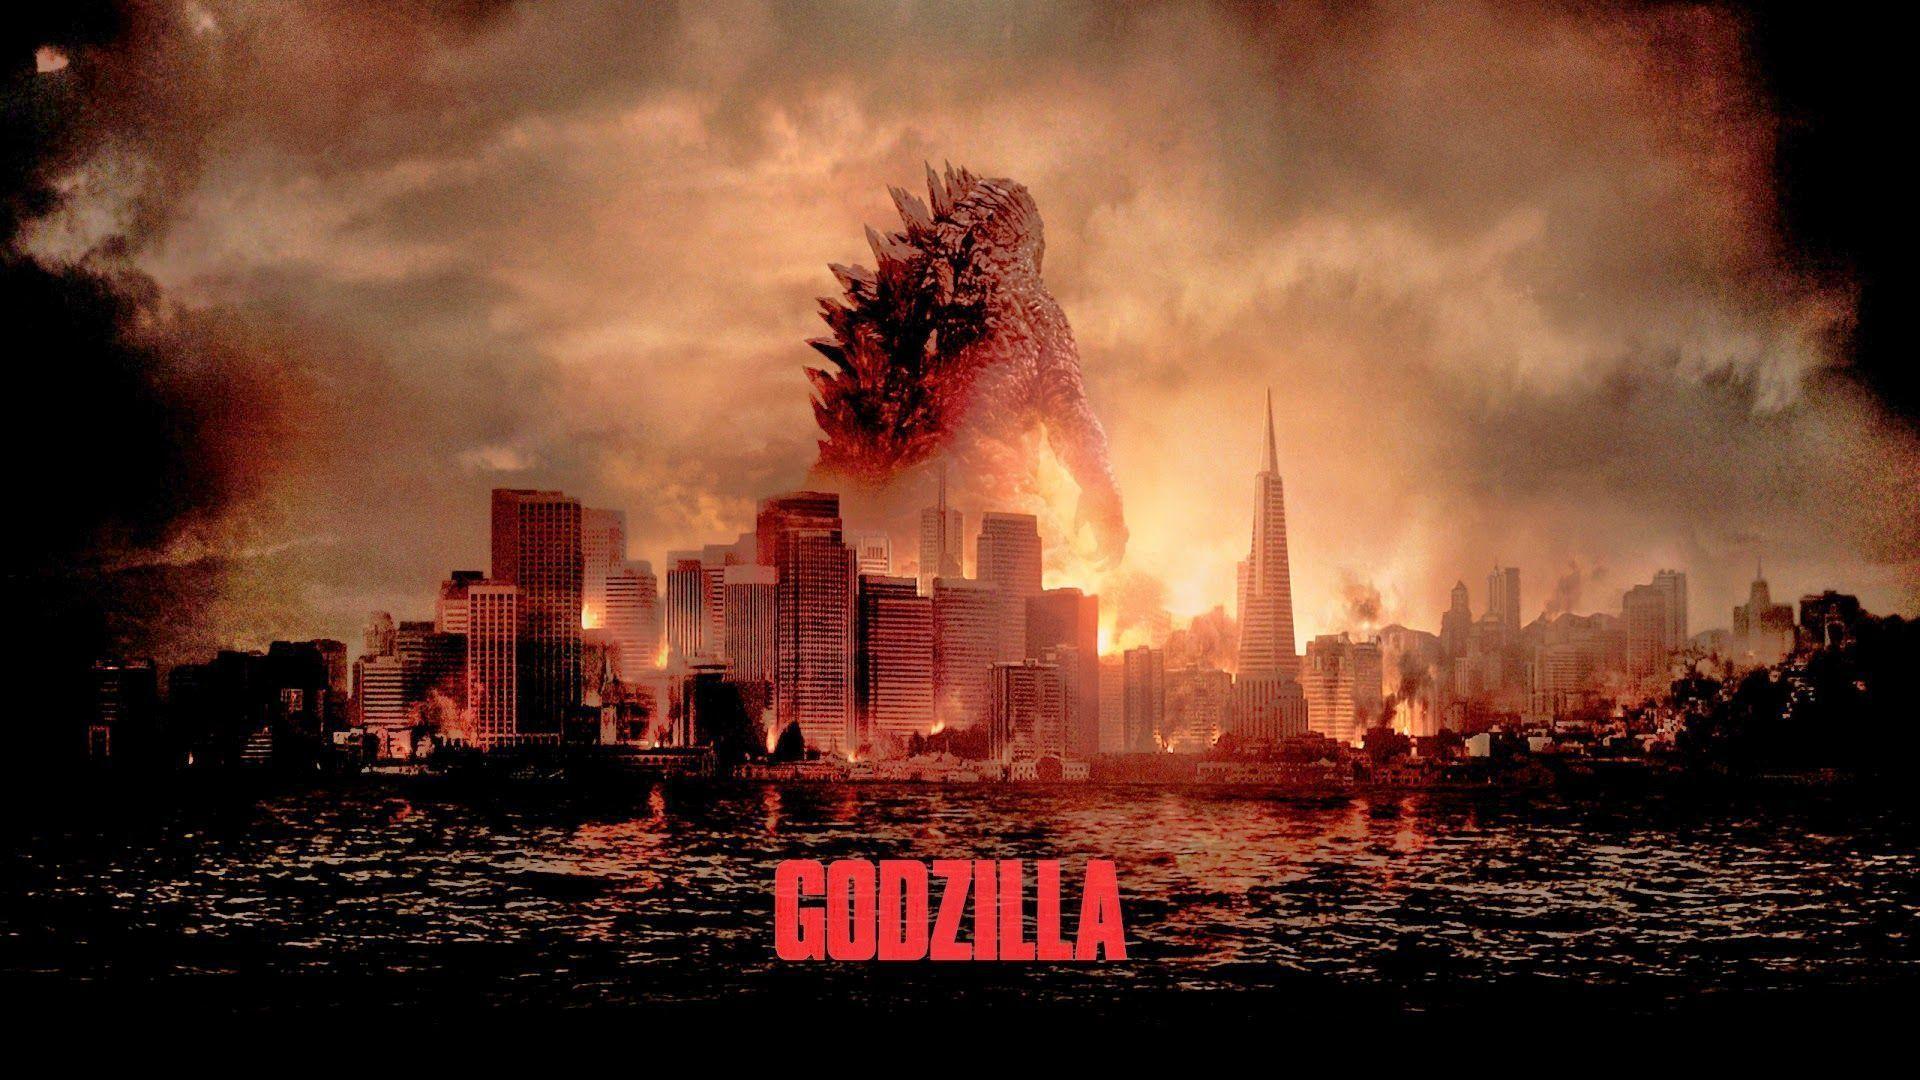 1920x1080 Godzilla